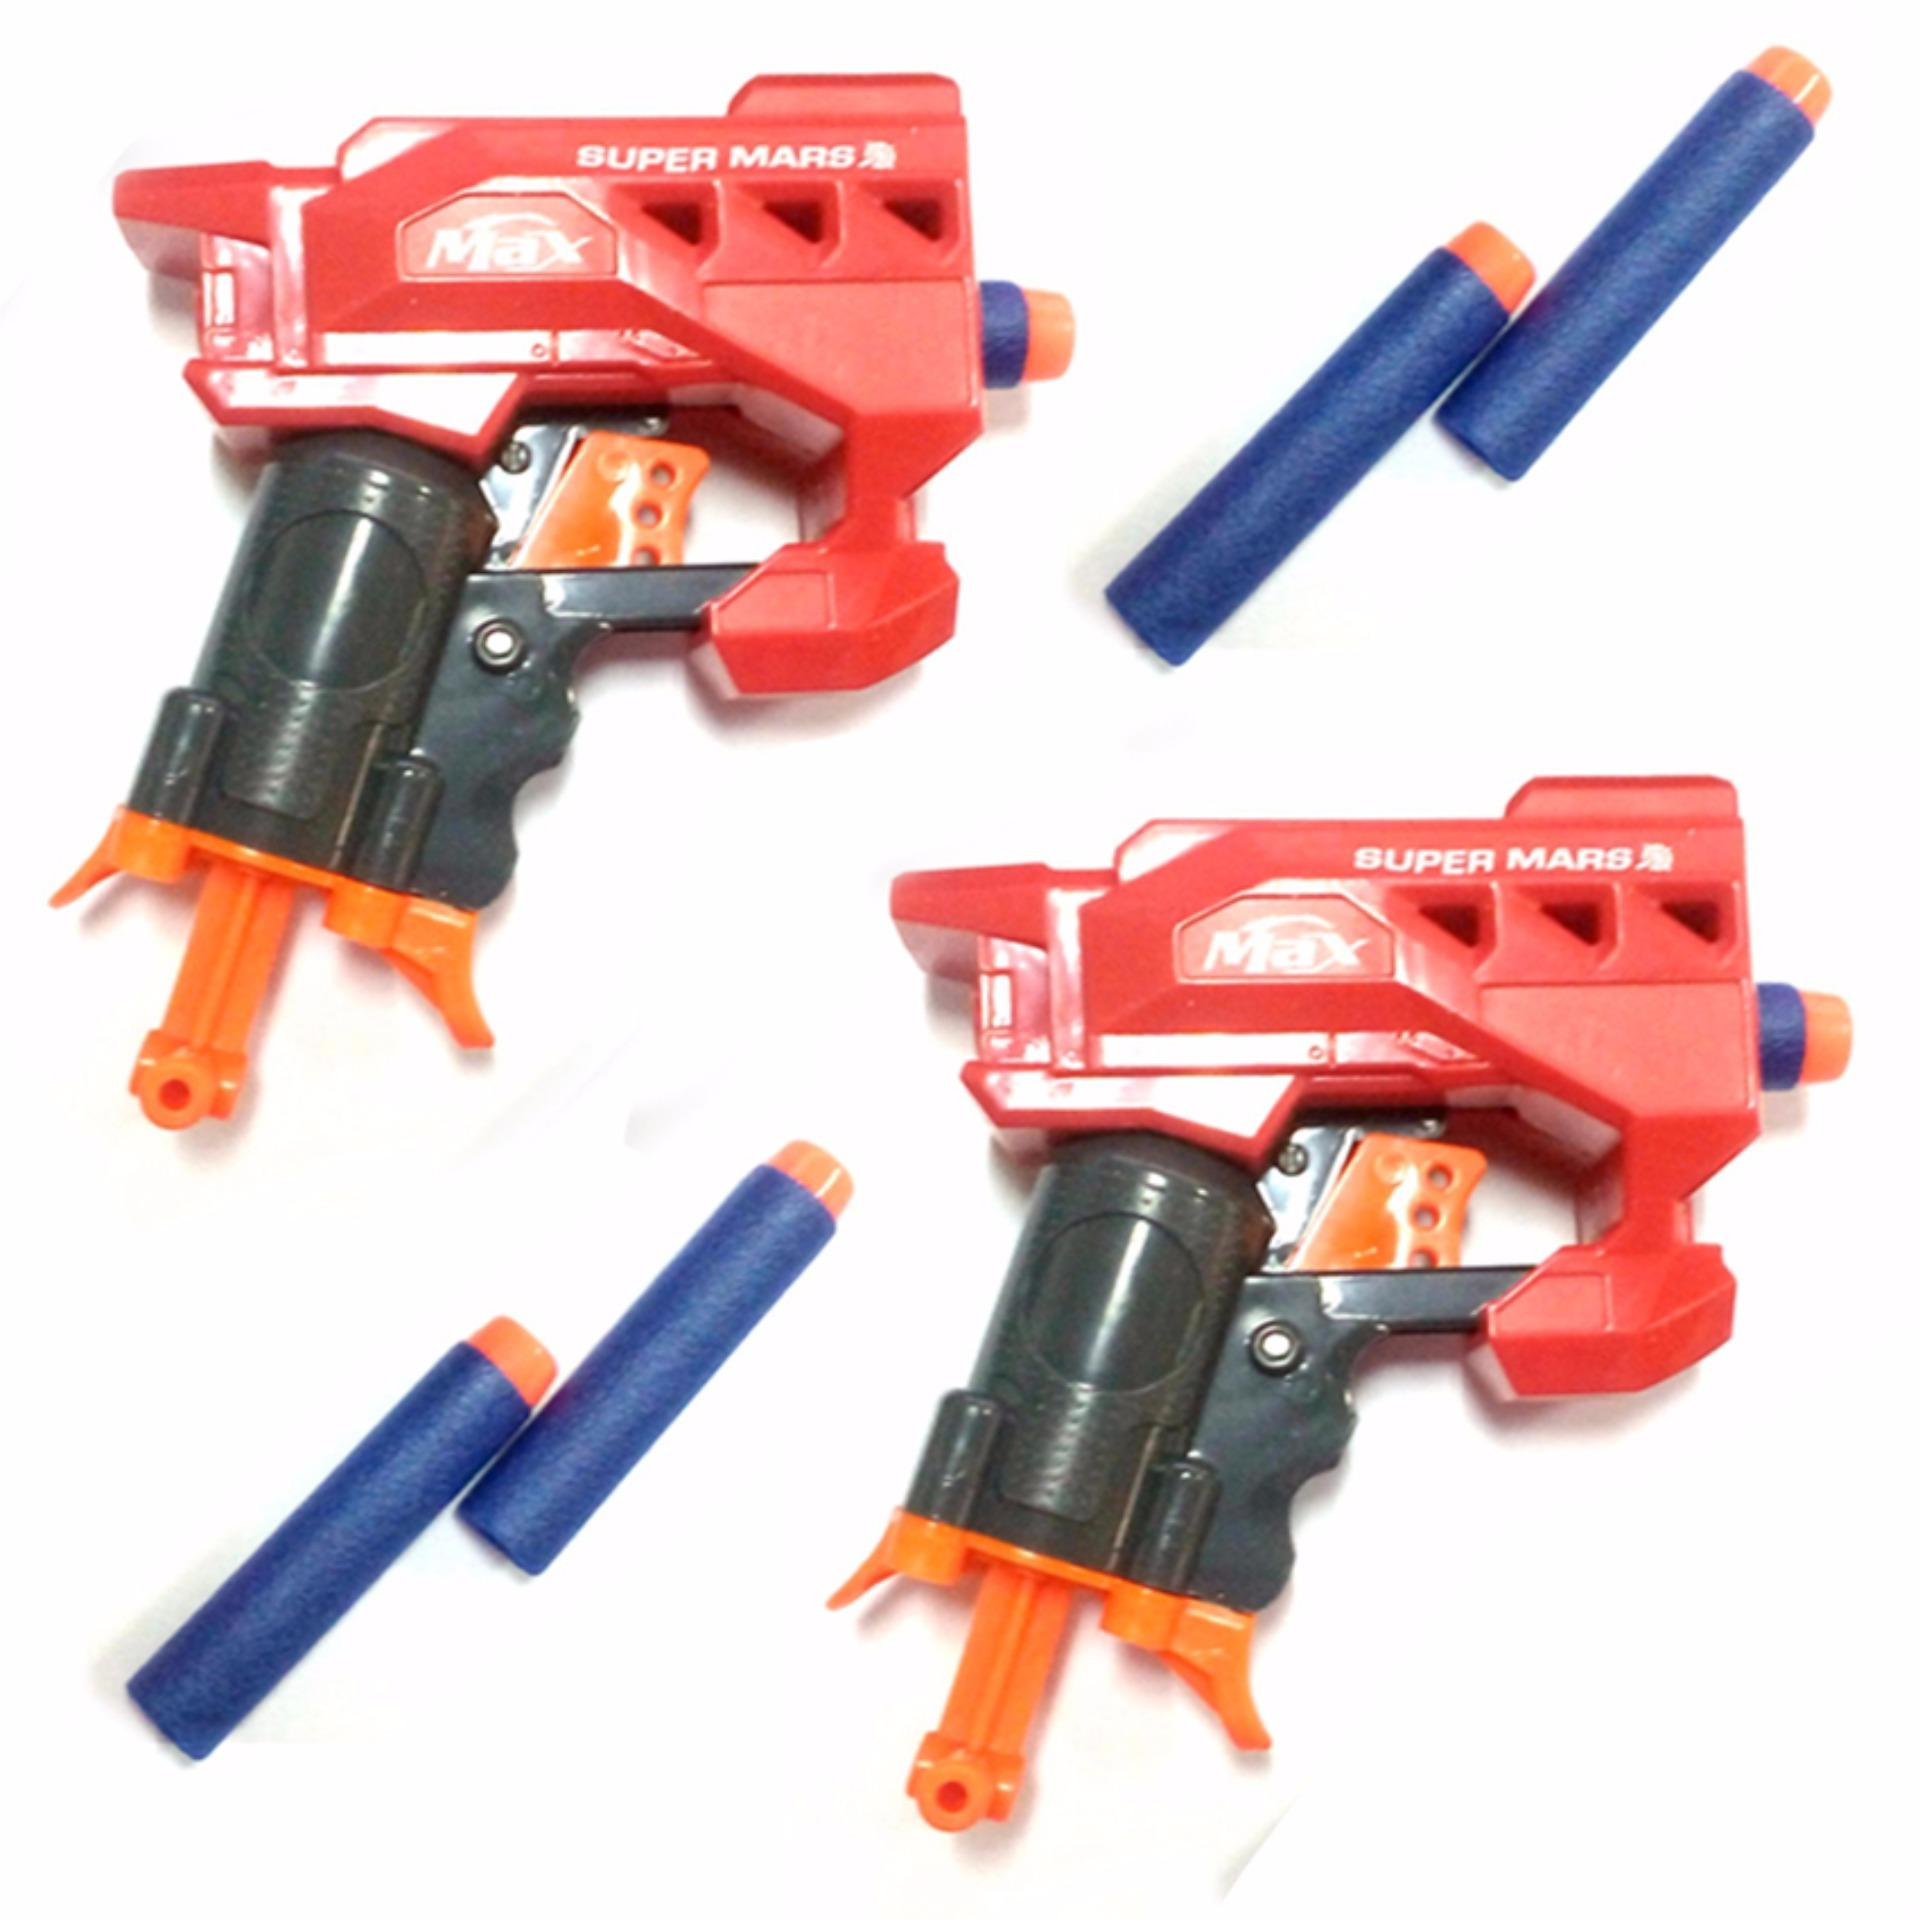 Philippines Nerf Gun Super Mars Soft Bullet Toy Set Of 2 Bundle Showdownred